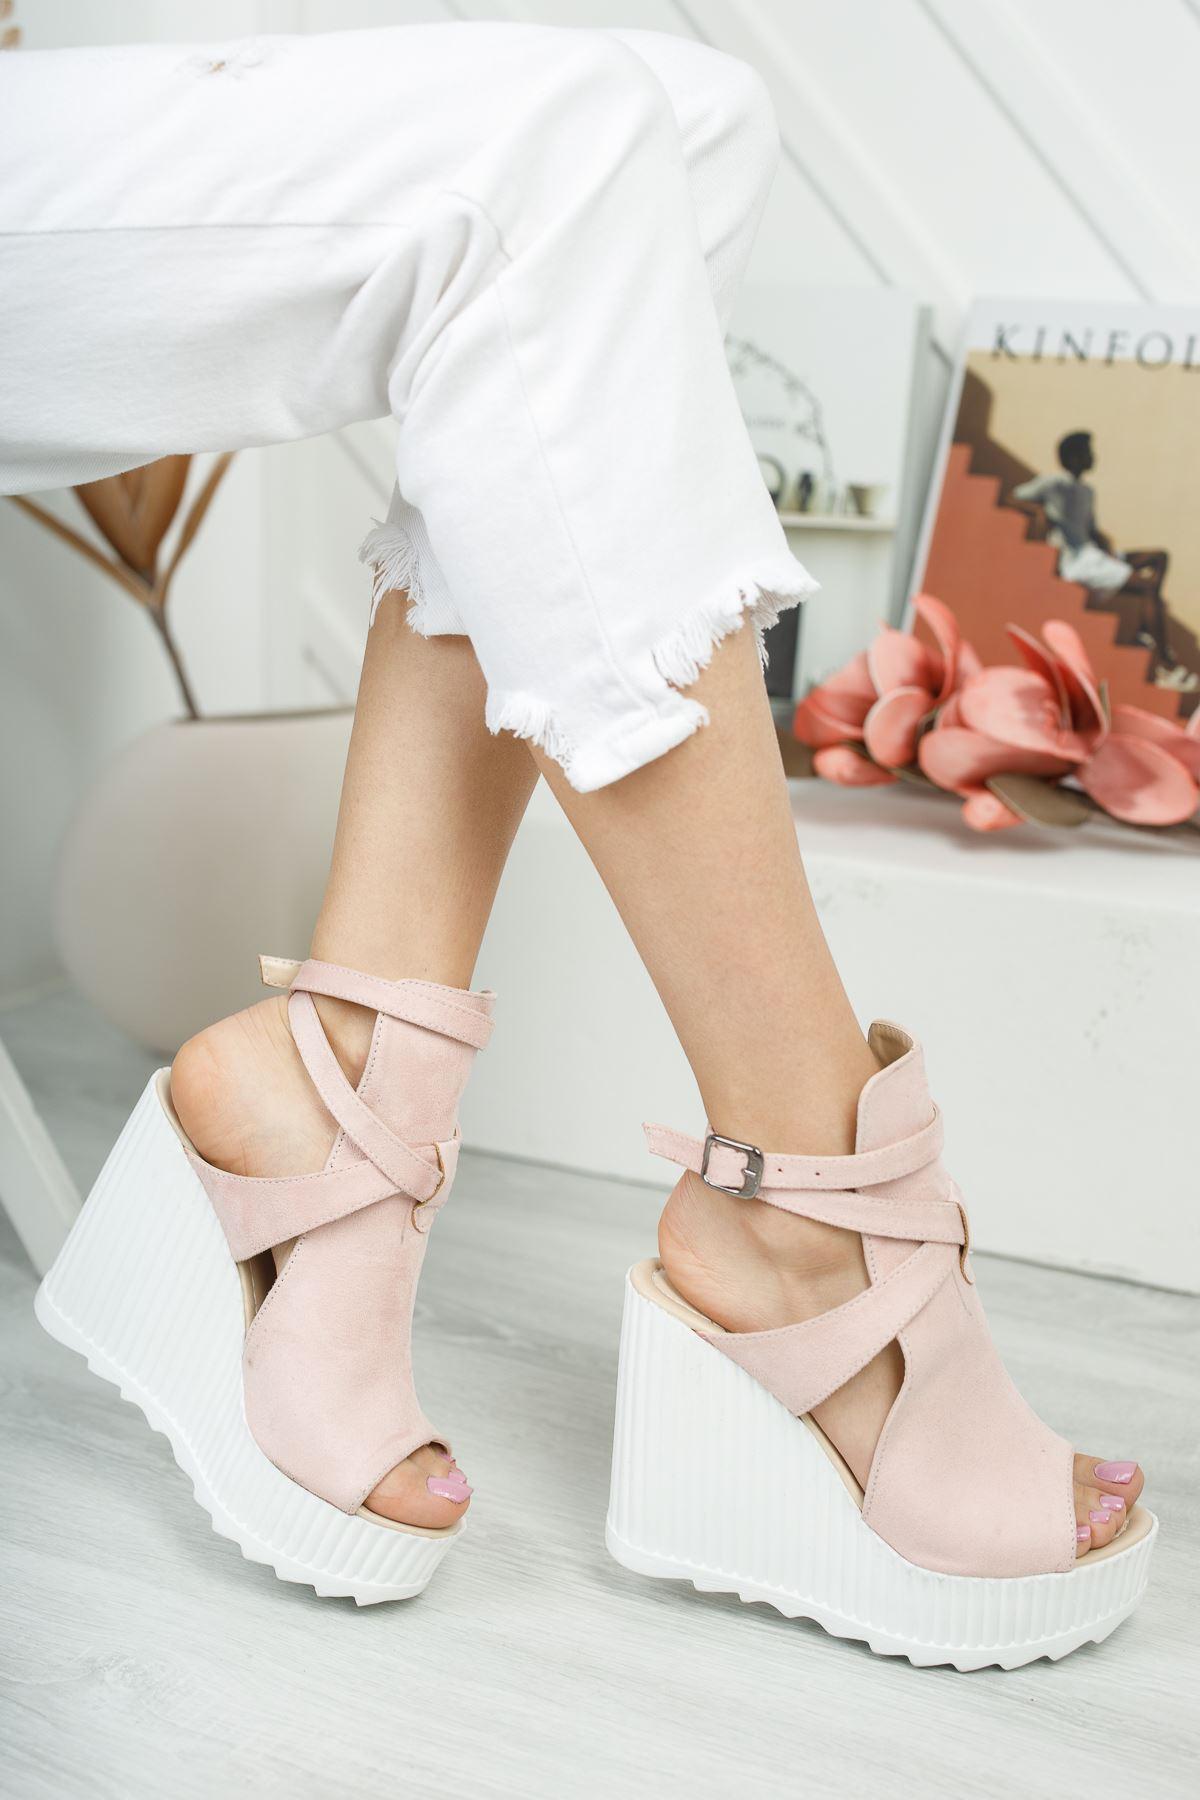 Gemaş Pudra Süet Platform Topuk Kadın Ayakkabı